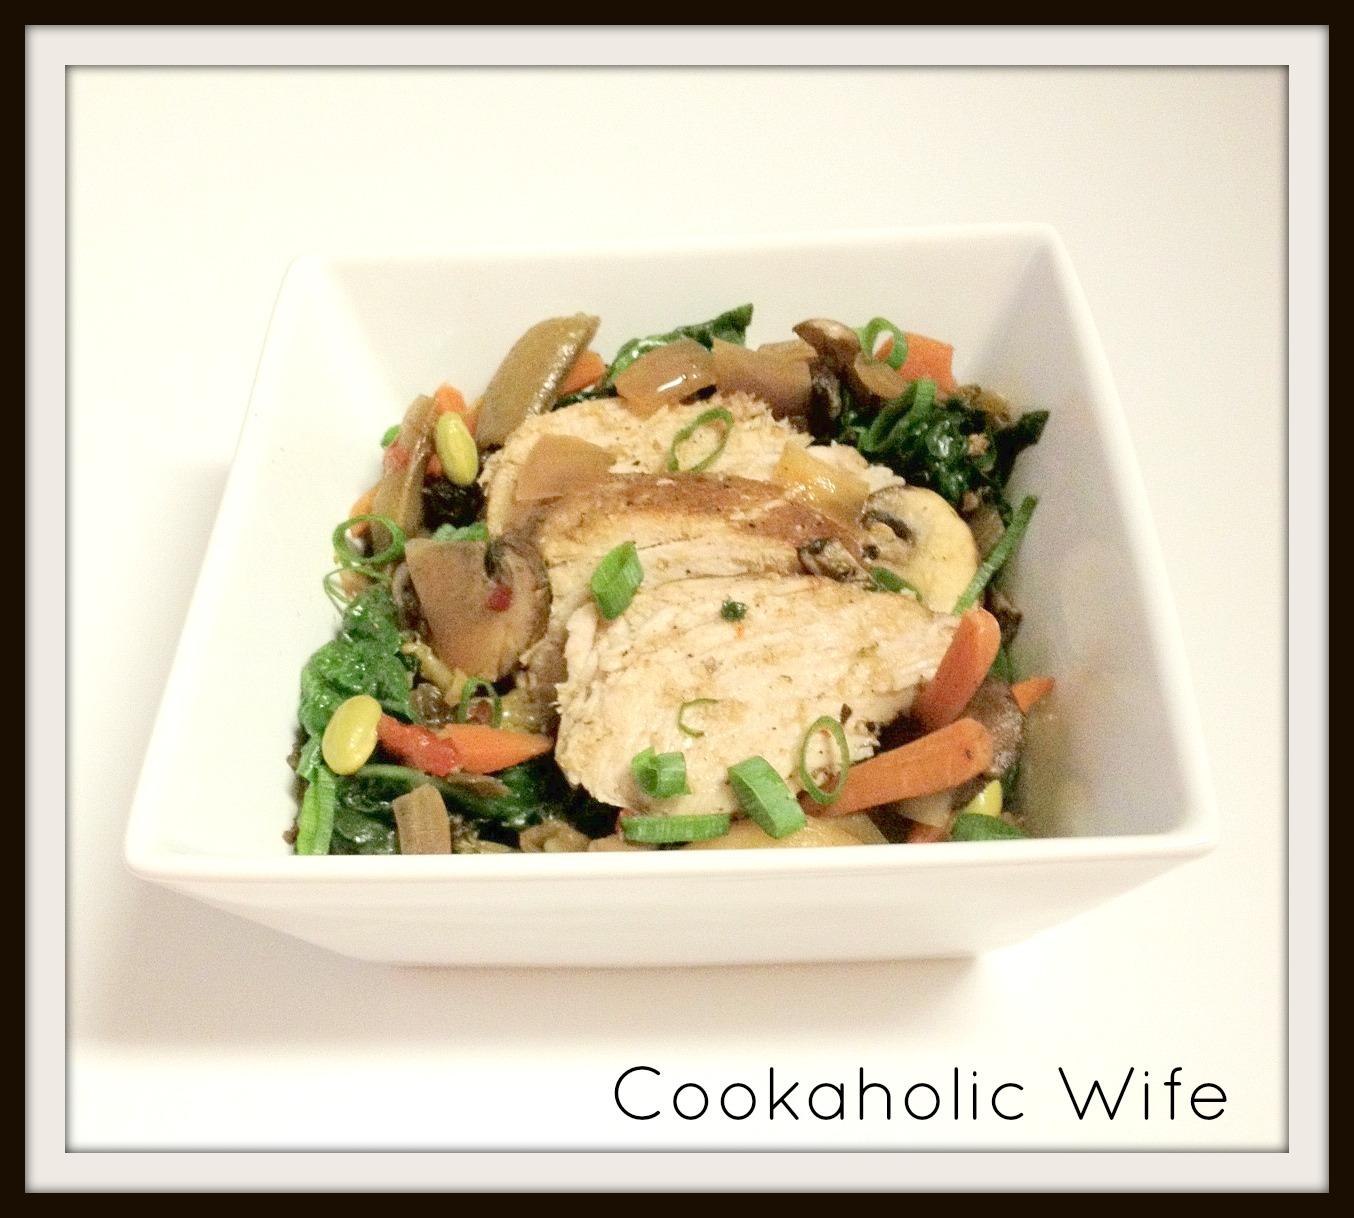 Cookaholic Wife: Crock Pot Asian Pork with Mushrooms